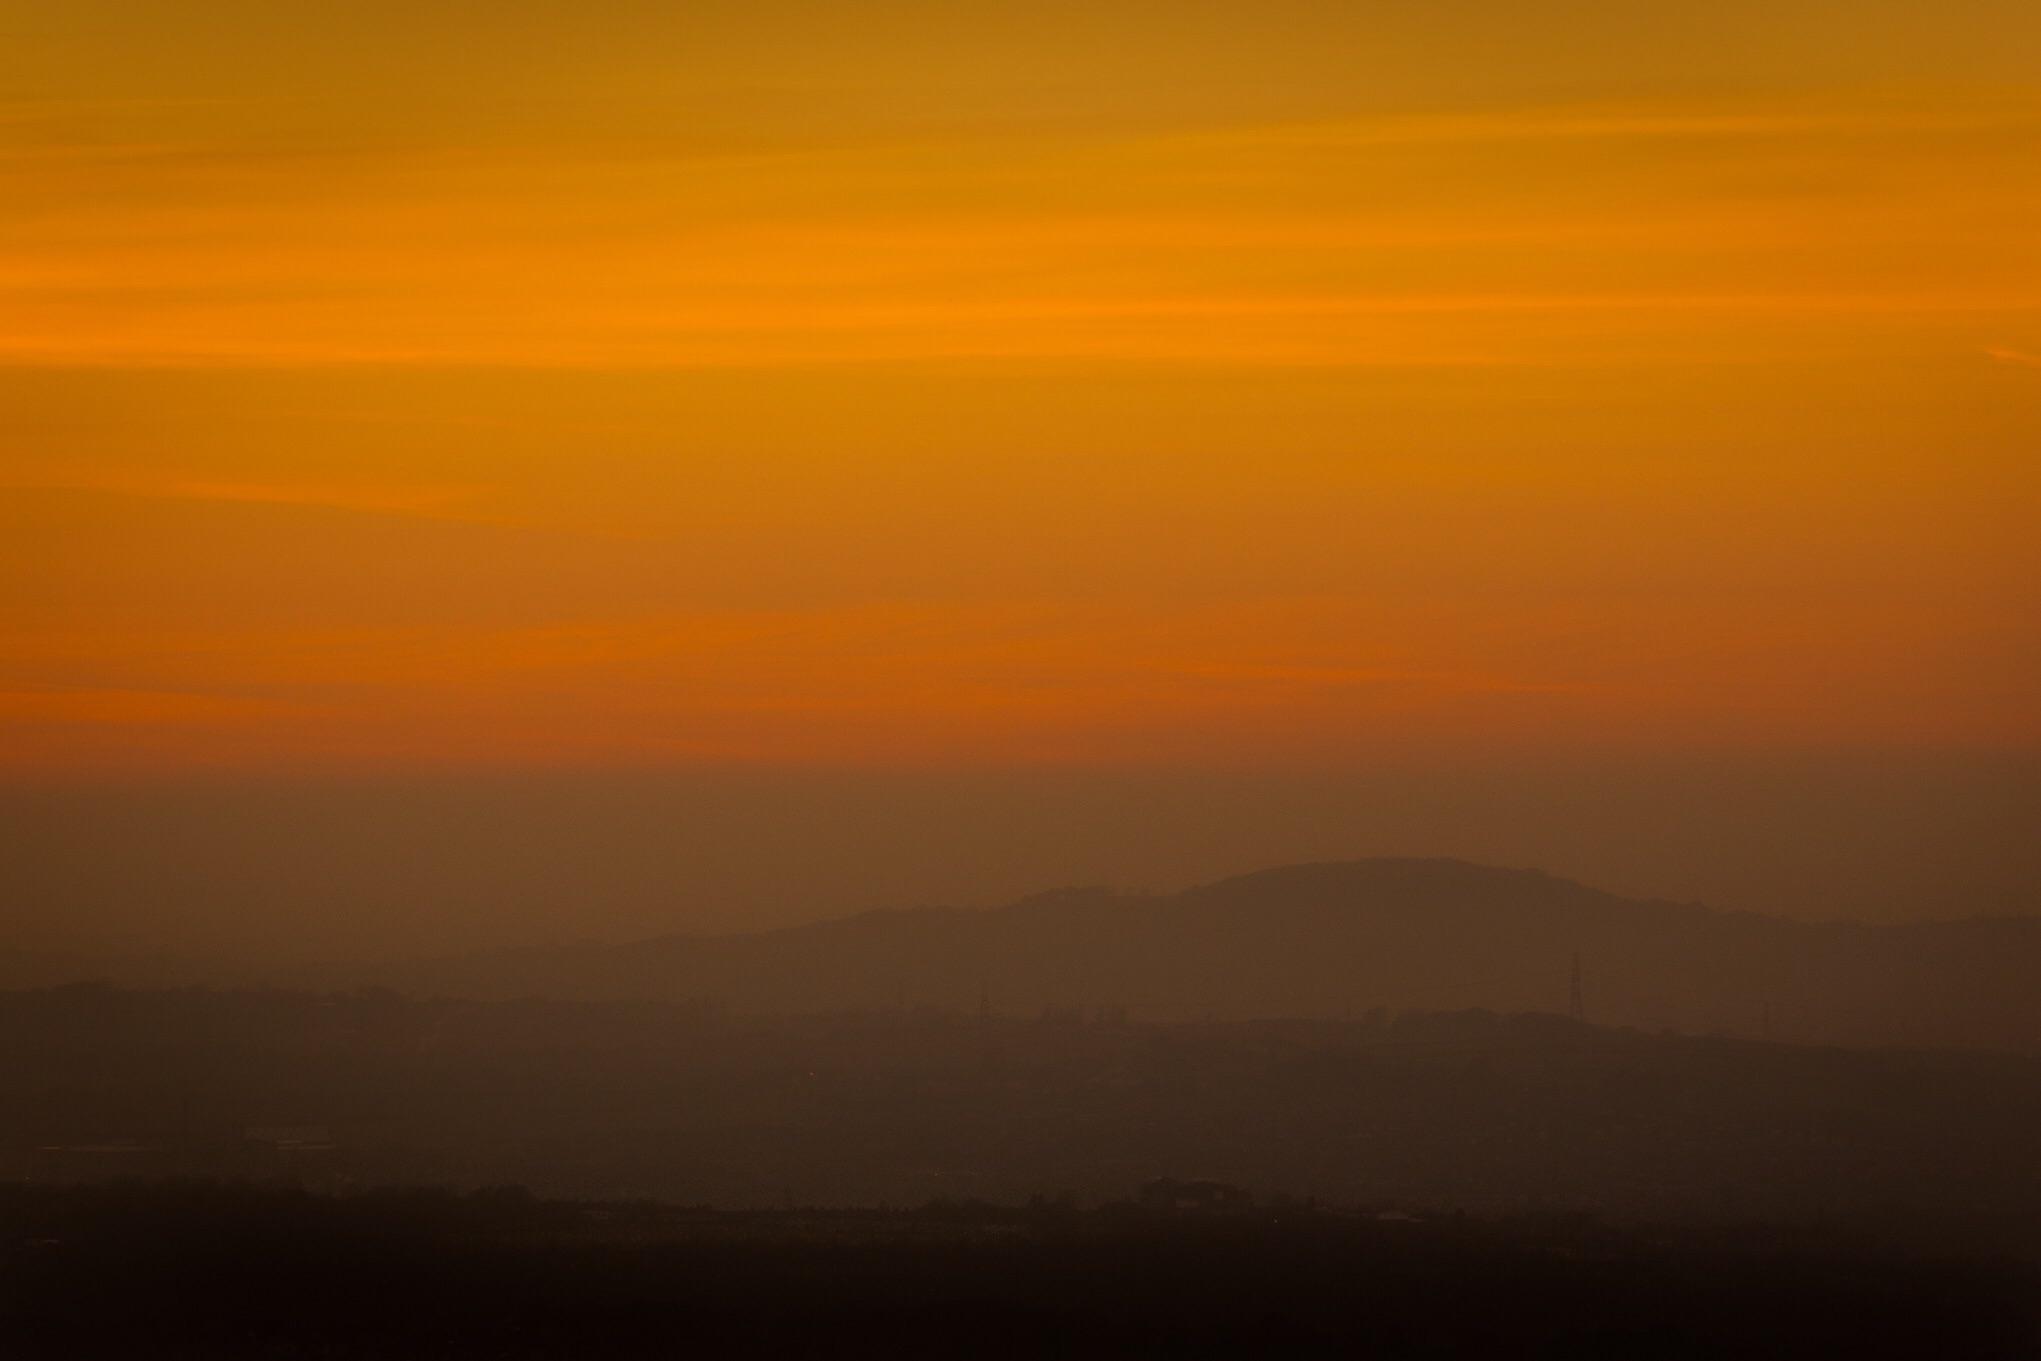 Sunset, England, by Rick McEvoy landscape photographer